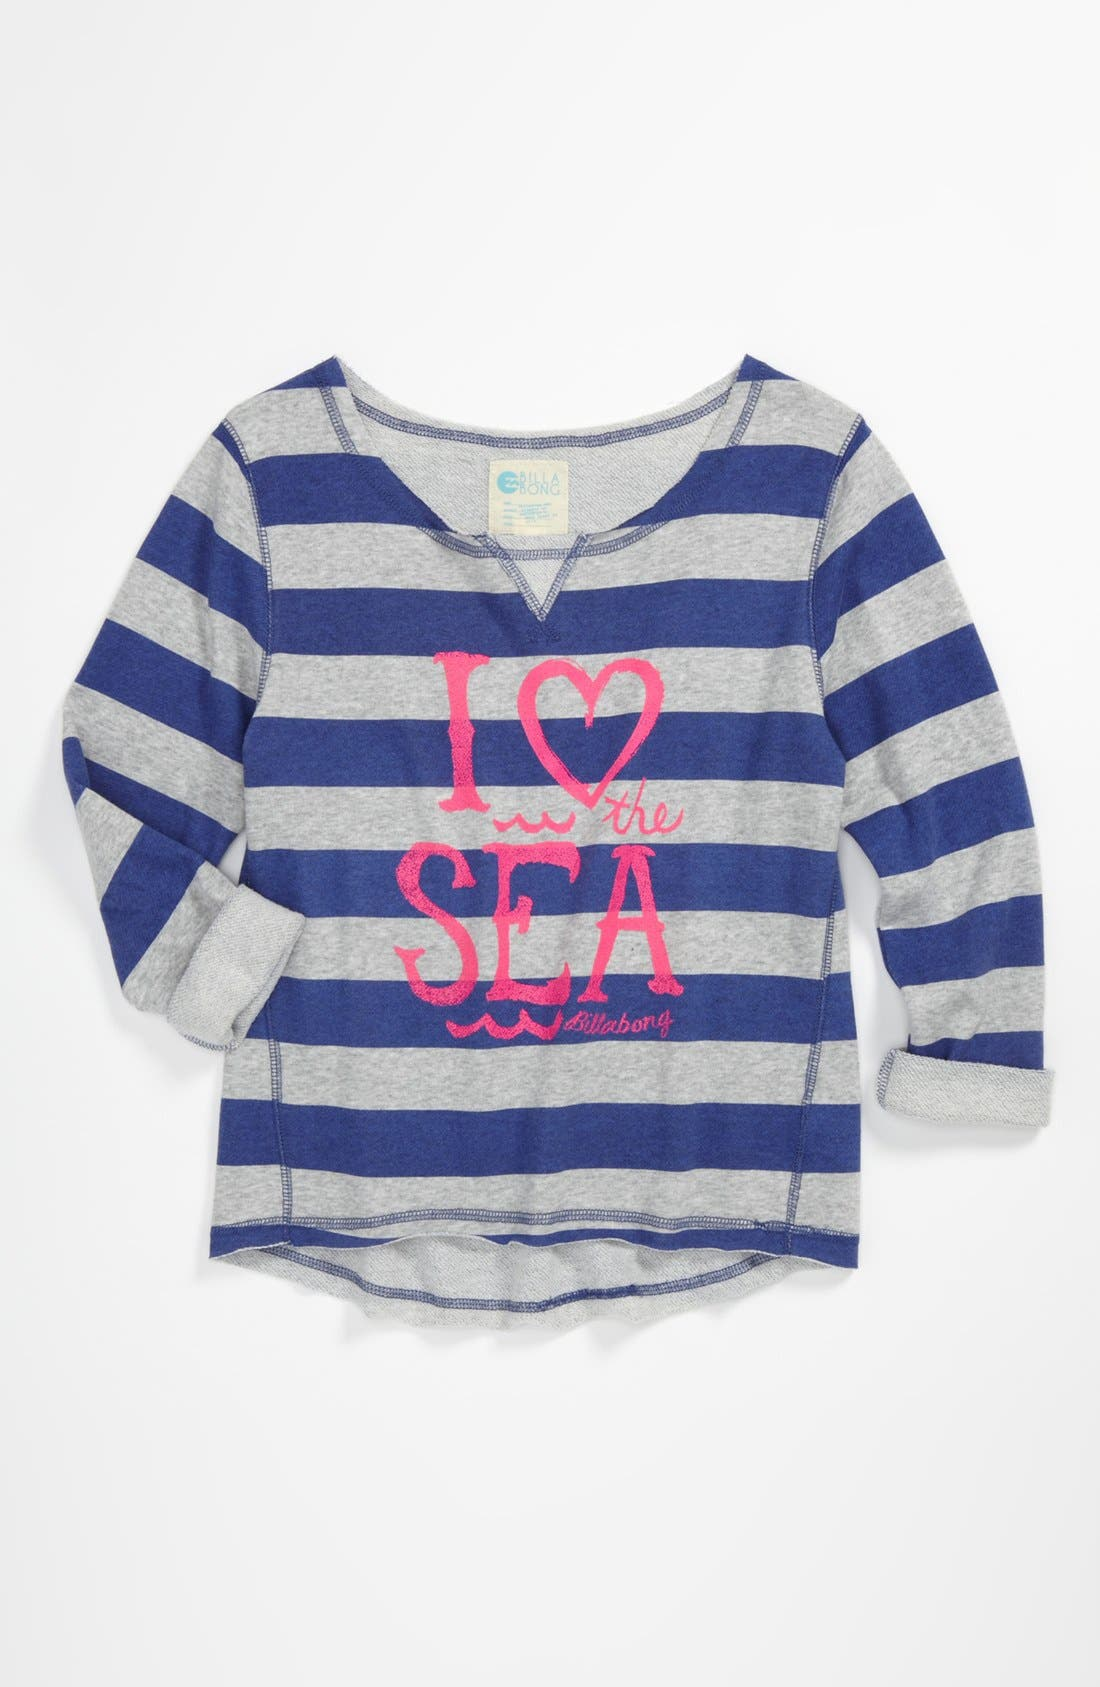 Alternate Image 1 Selected - Billabong 'Breaking It Down' Sweatshirt (Big Girls)